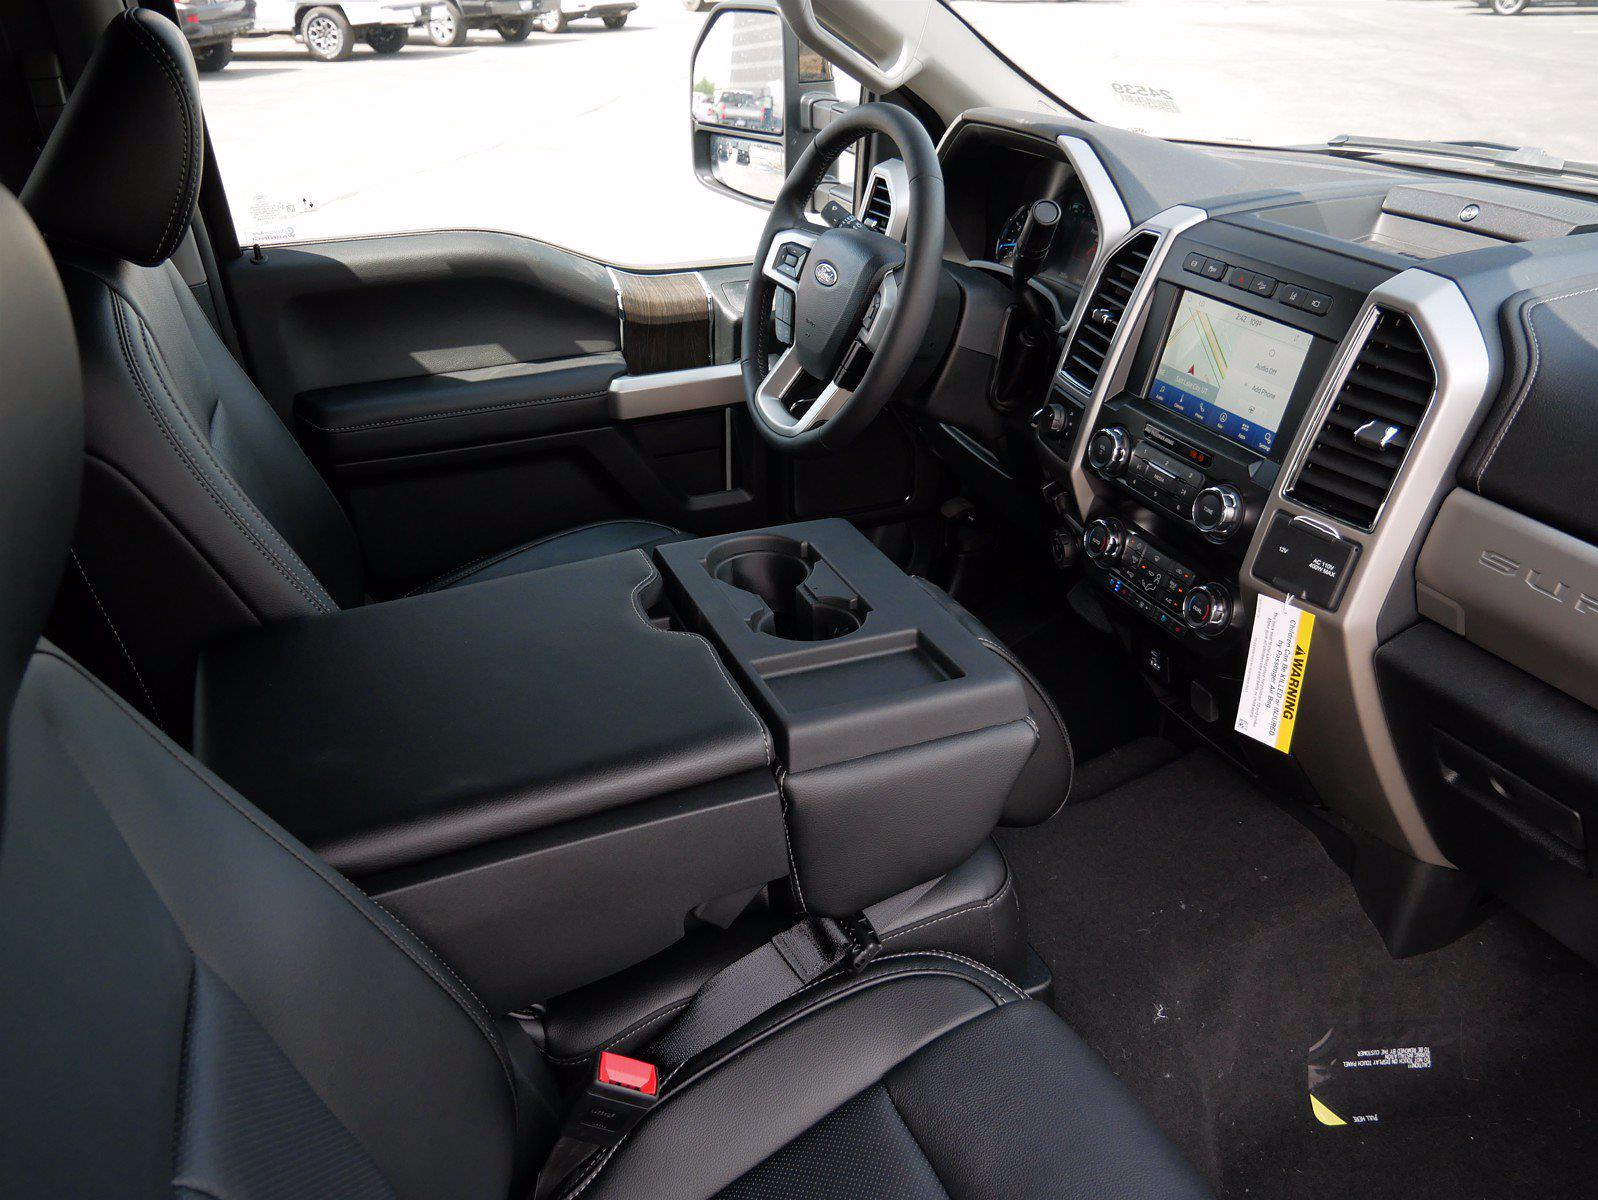 2021 Ford F-350 Crew Cab 4x4, Pickup #24539 - photo 34